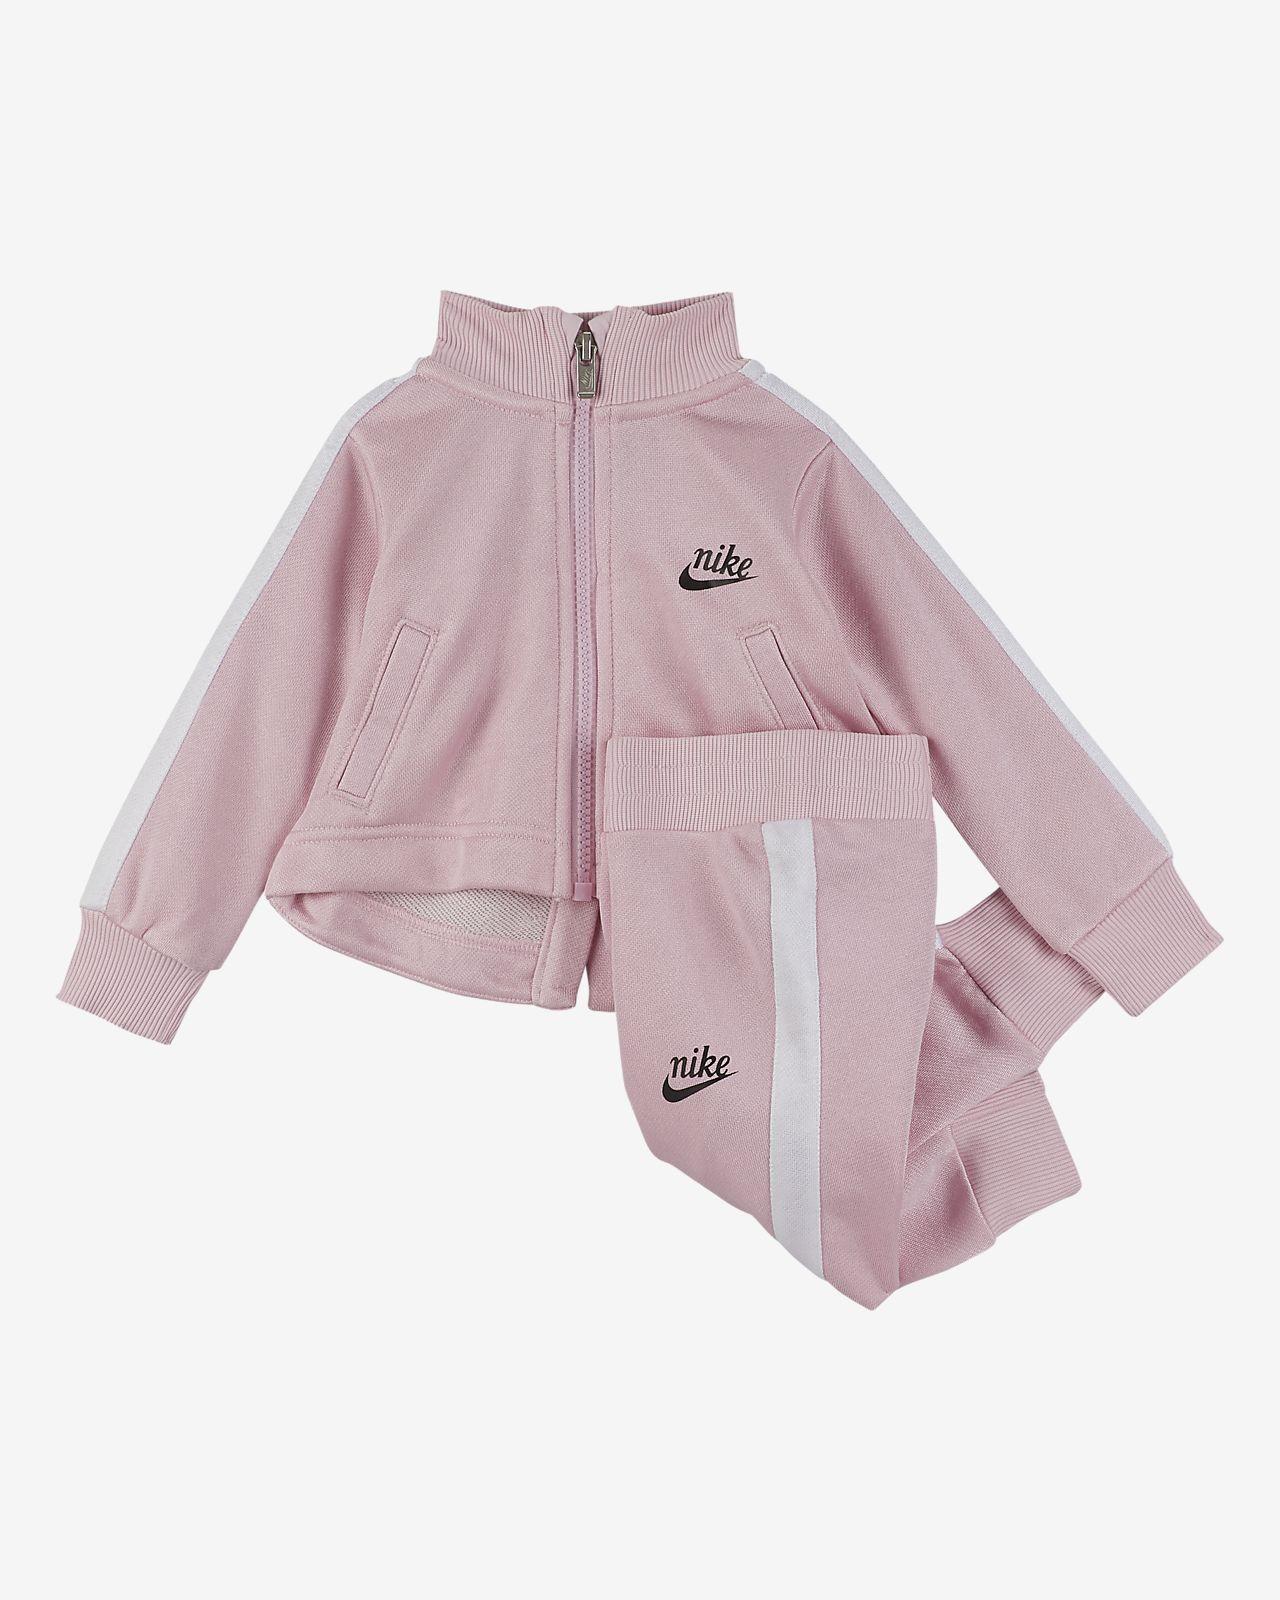 Completo in 2 pezzi Nike Sportswear - Neonati (12-24 mesi)